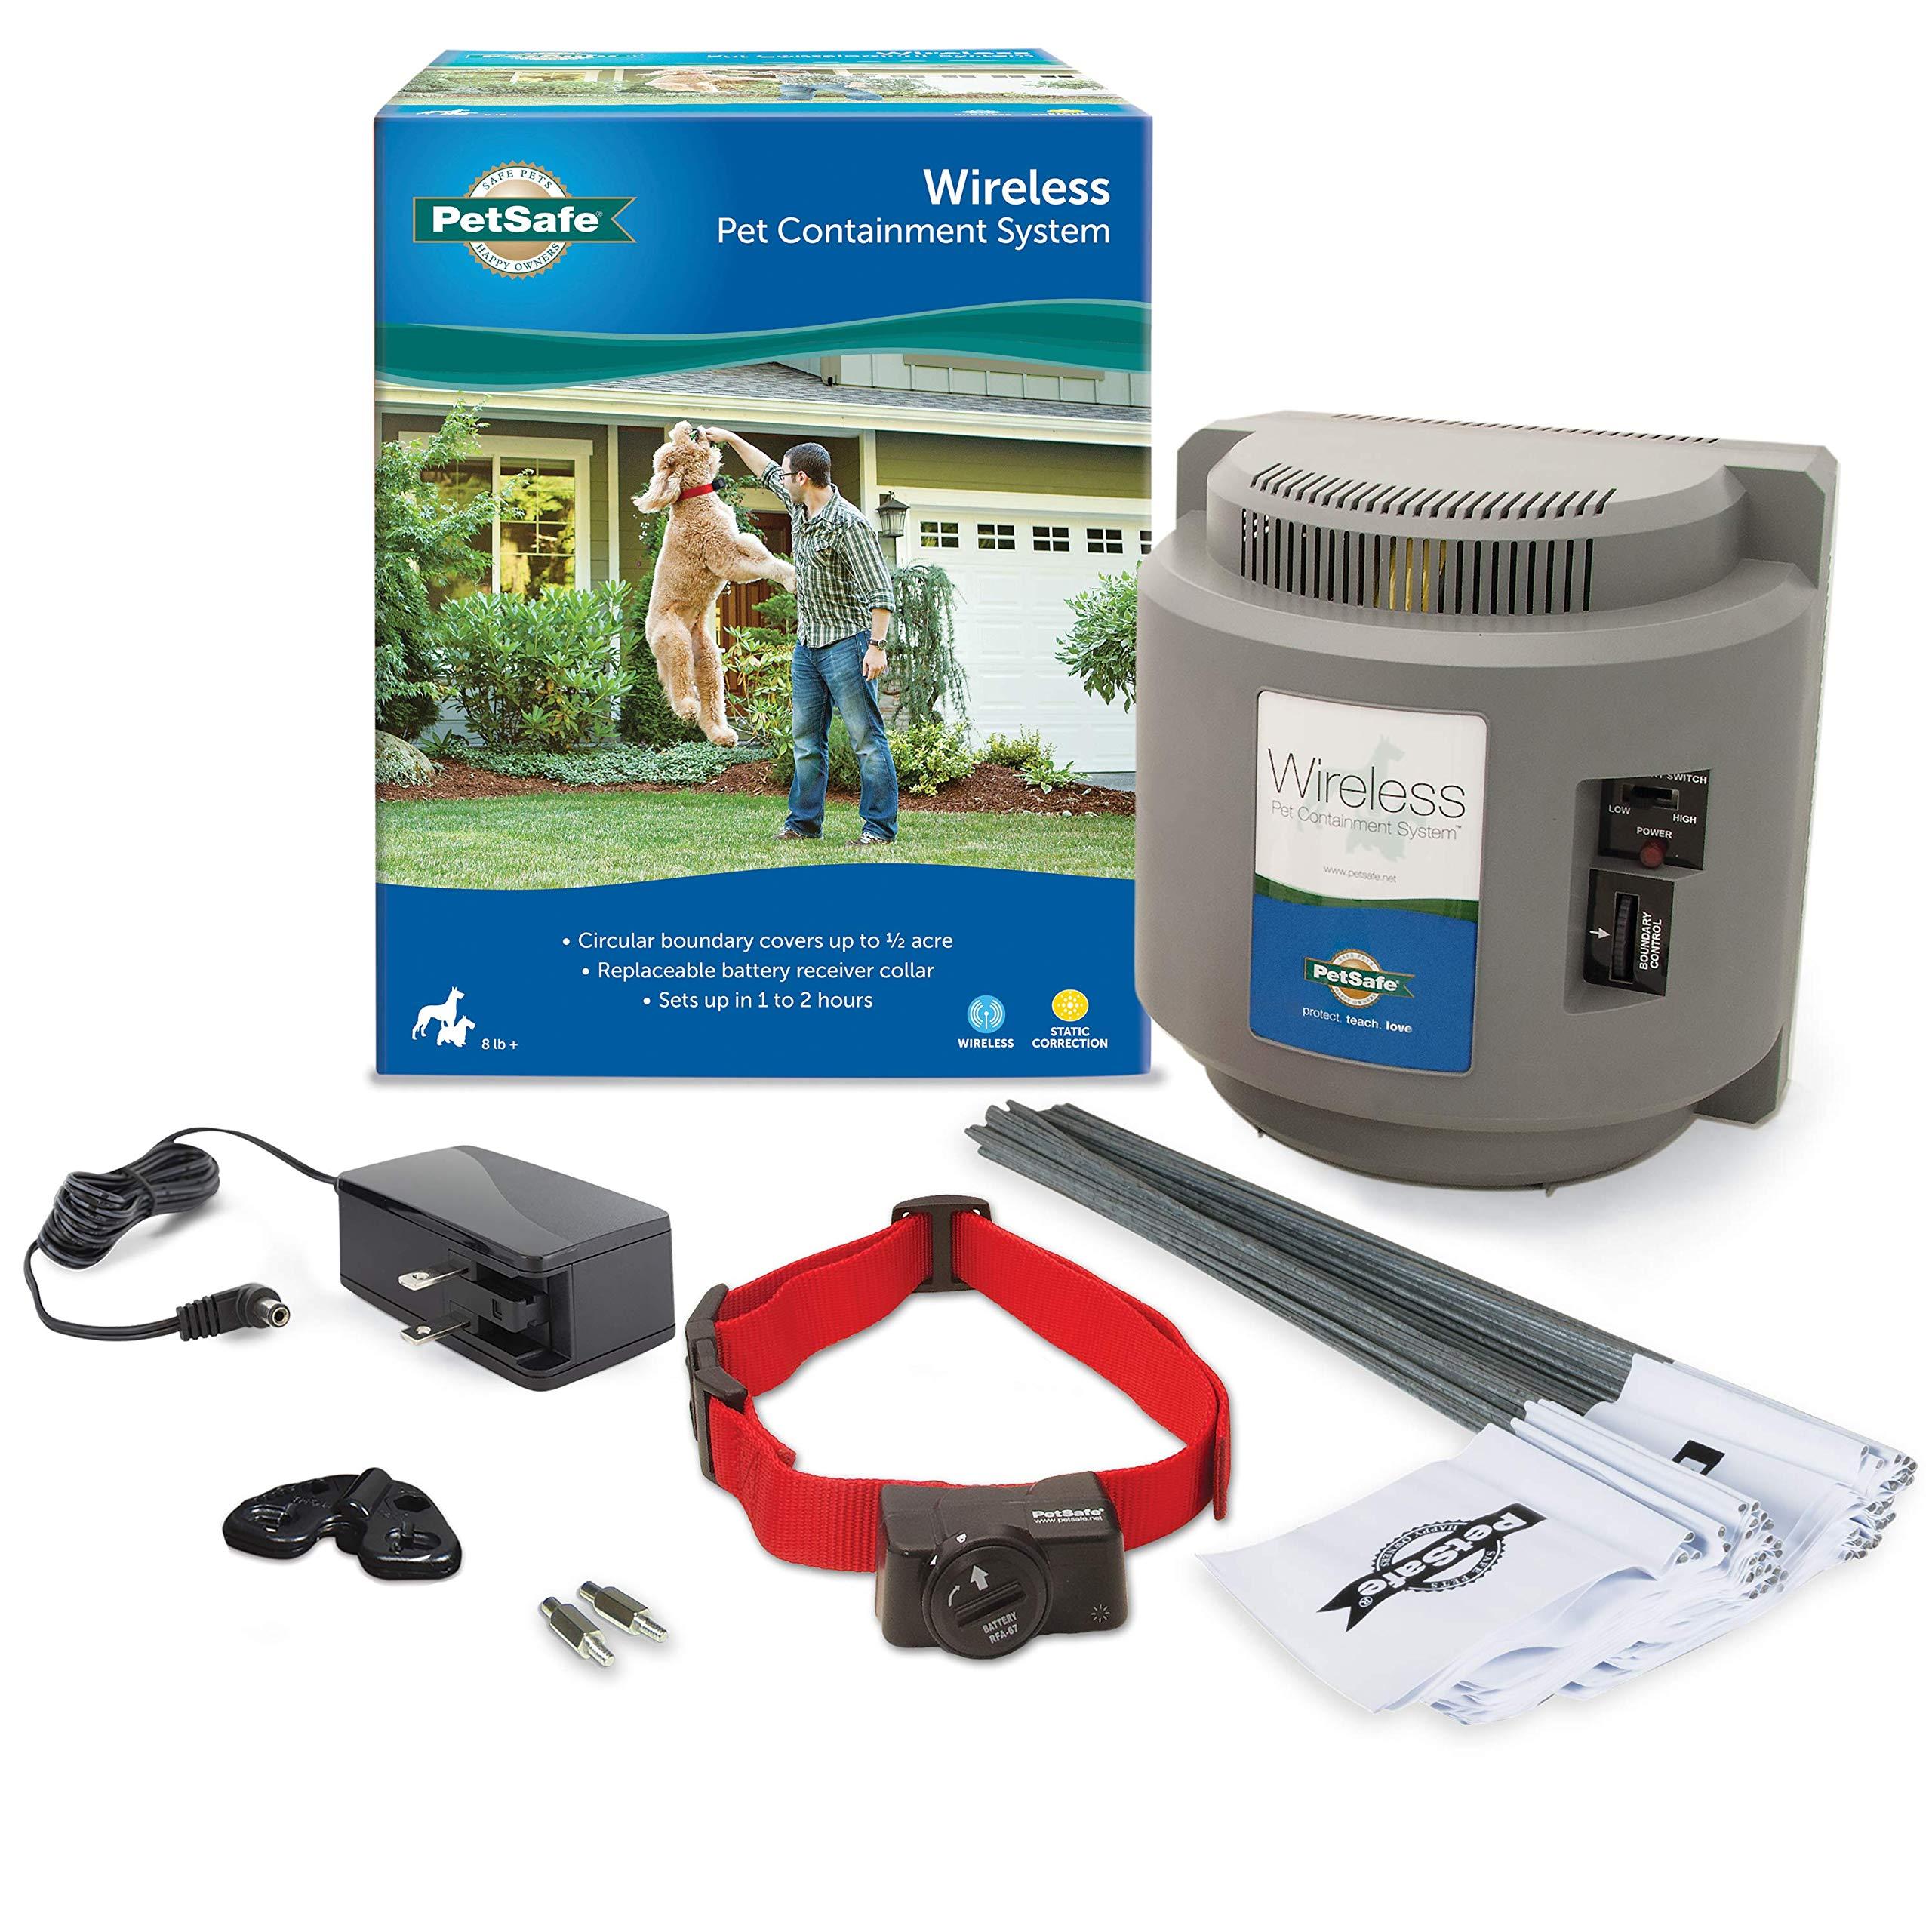 PetSafe Wireless Containment Waterproof Correction